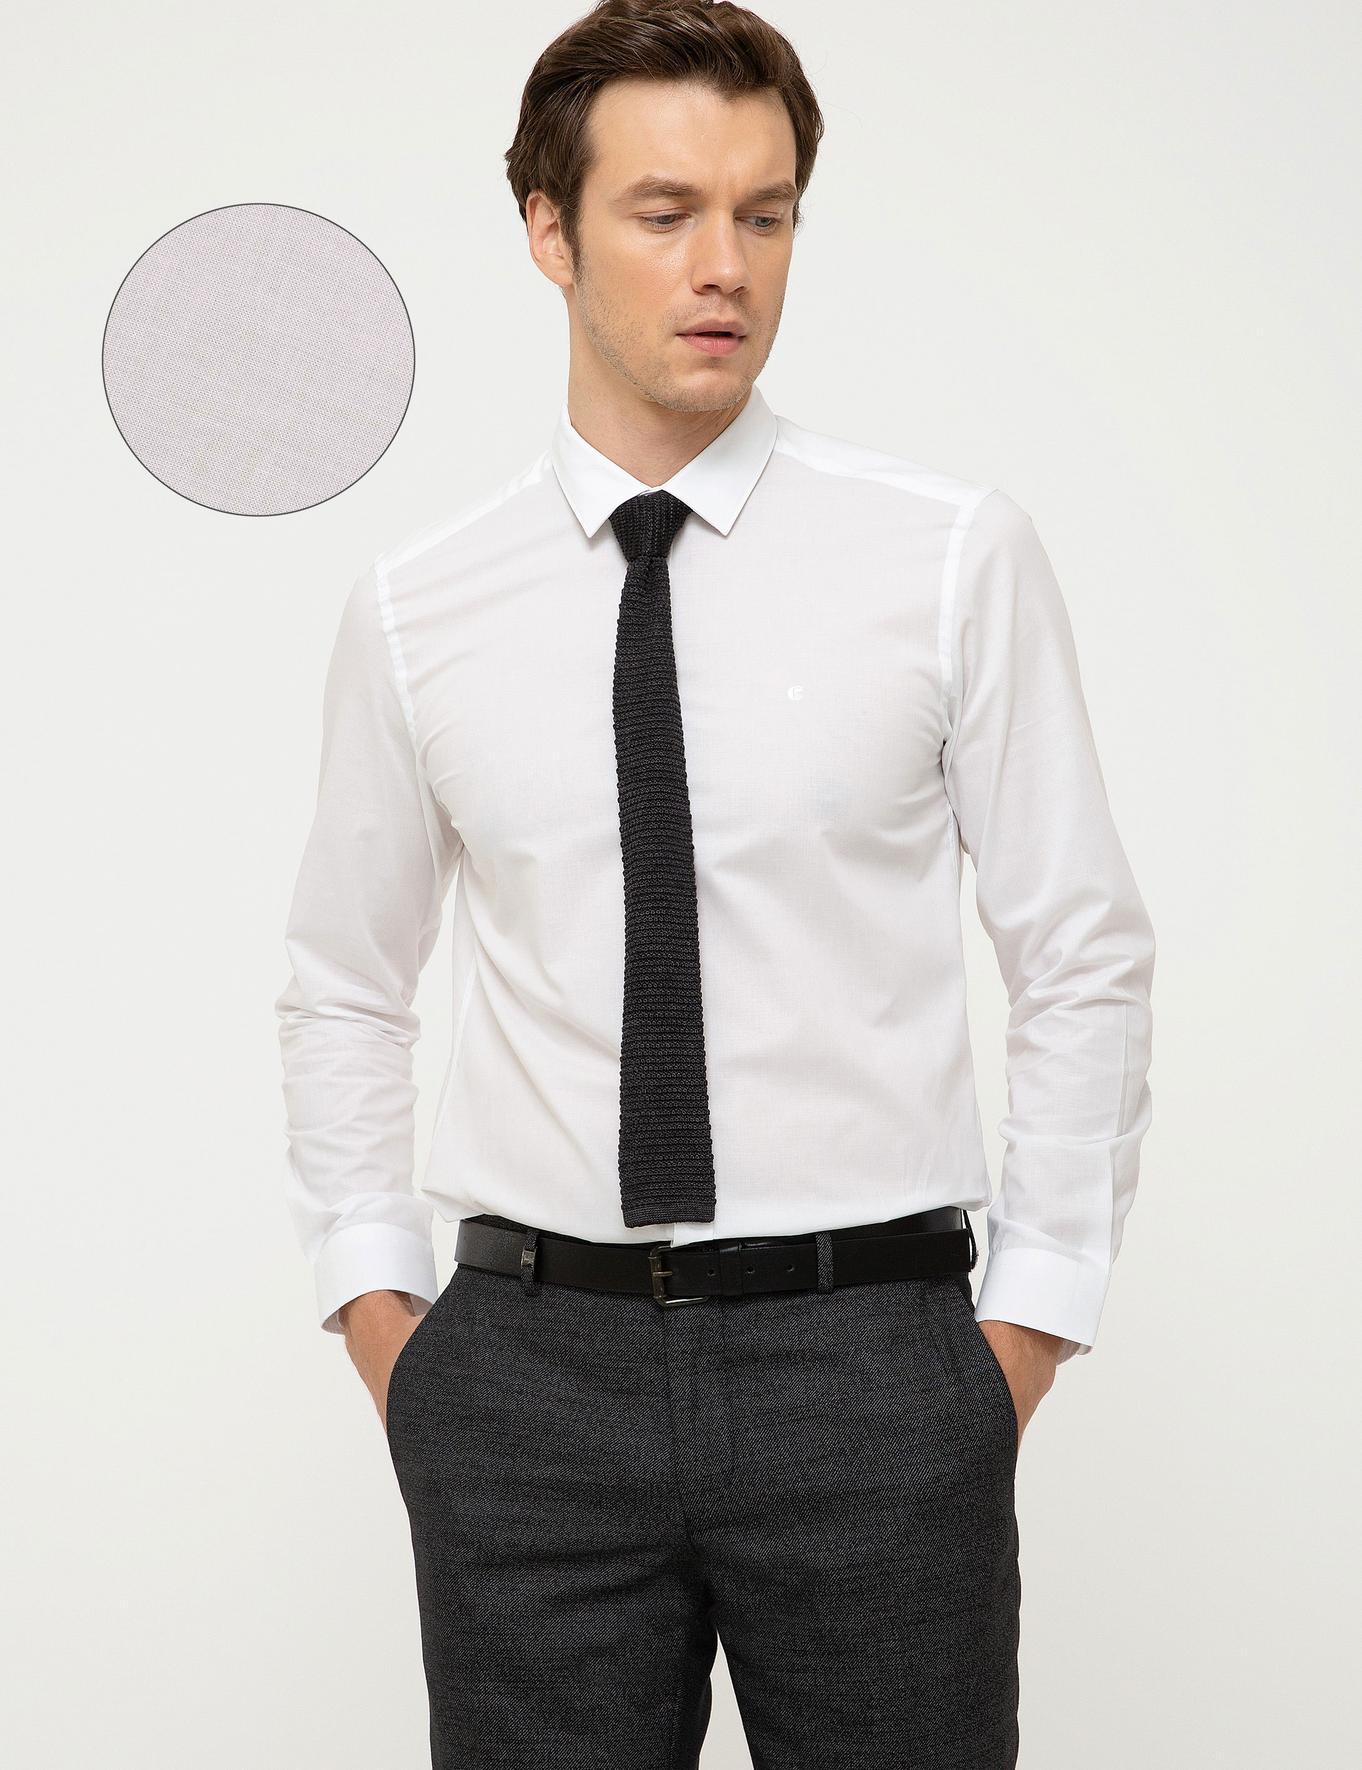 Beyaz Slim Fit Gömlek - 50217750005